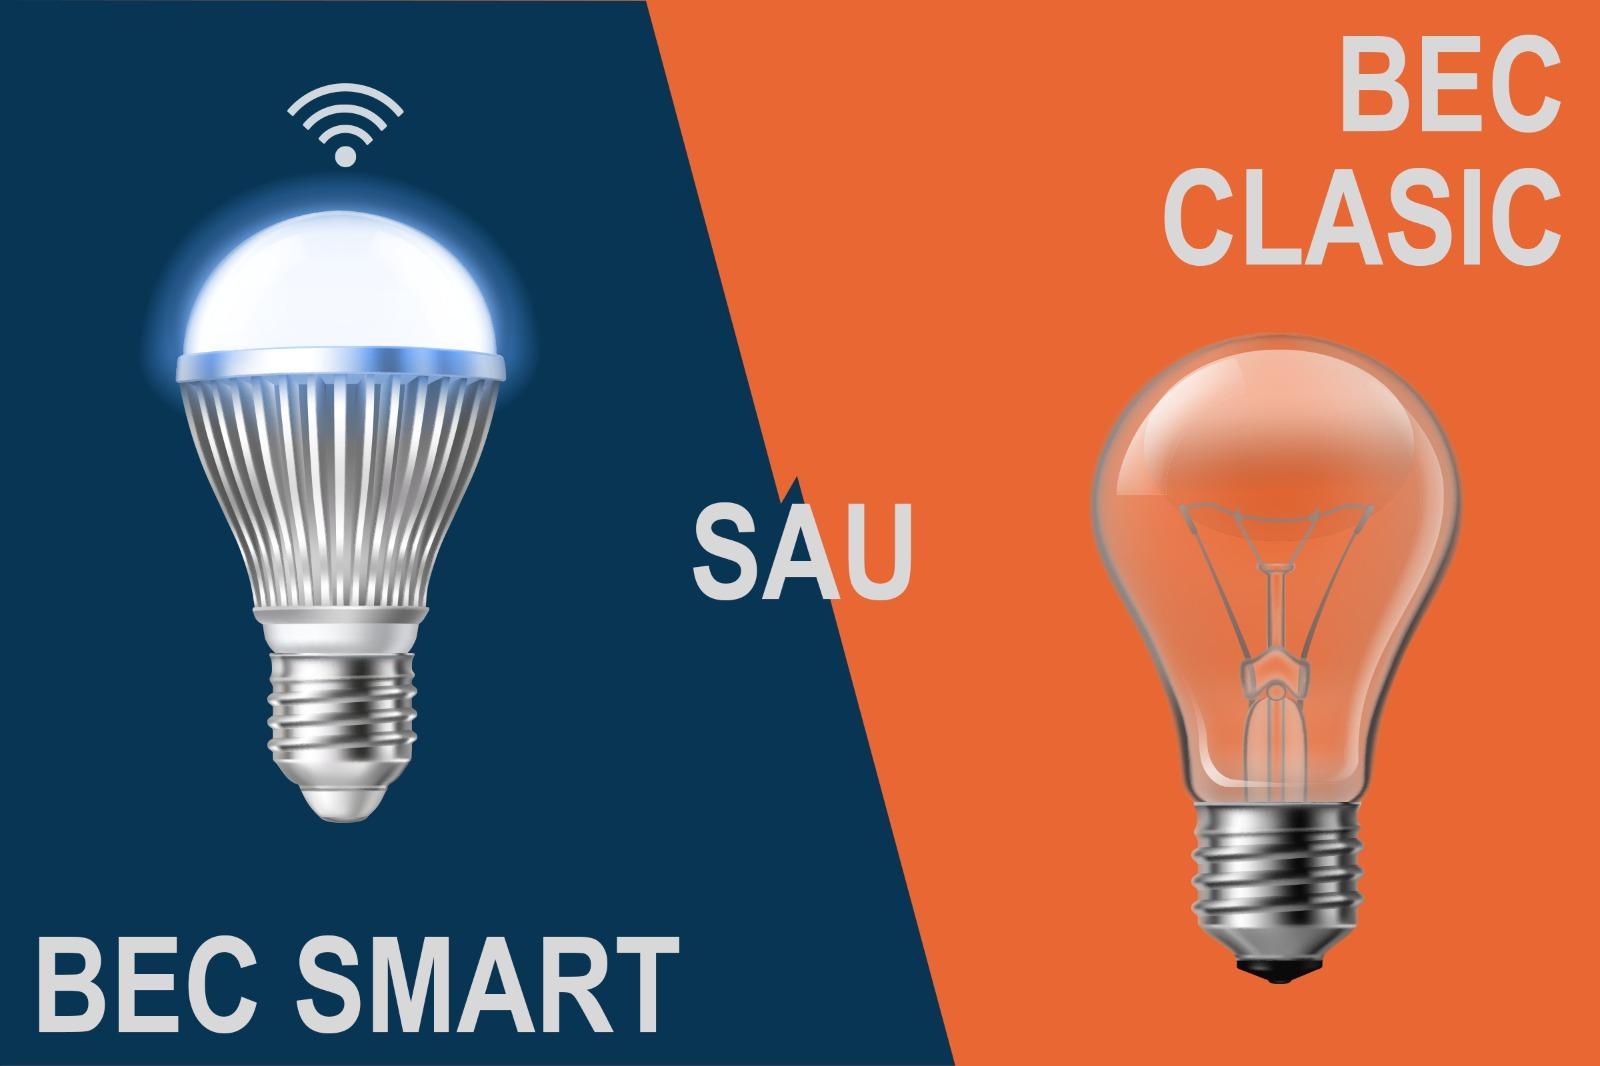 smart bulvs vs clasic bulbs